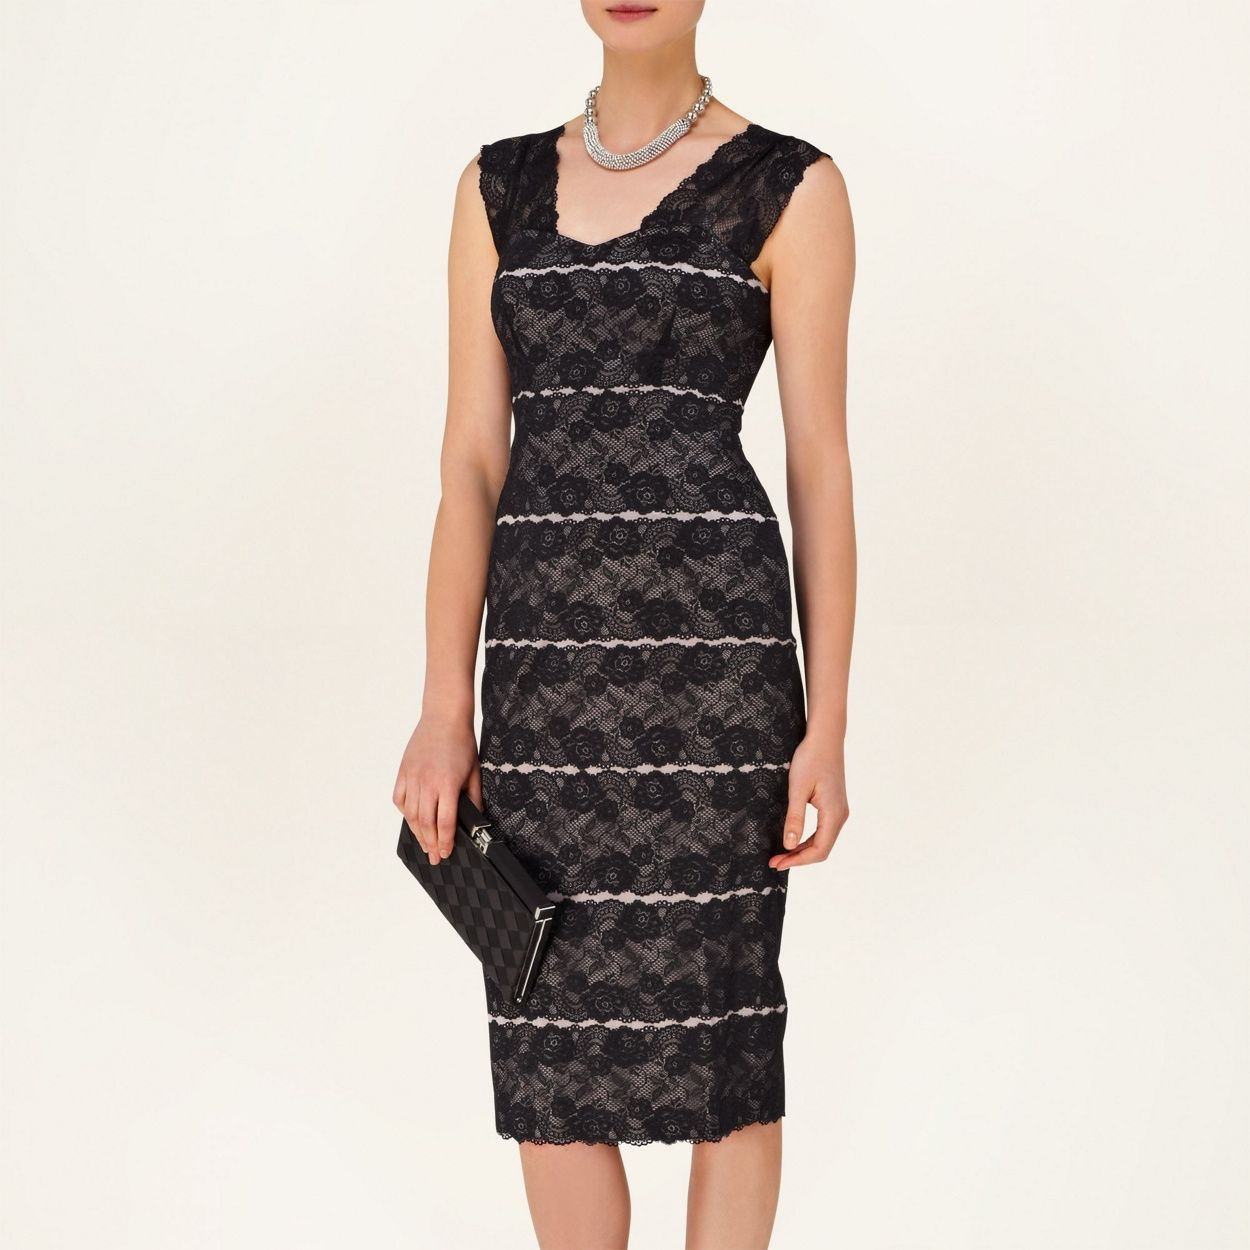 Black dress debenhams - Phase Eight Black And Mink Dahlia Lace Dress At Debenhams Com